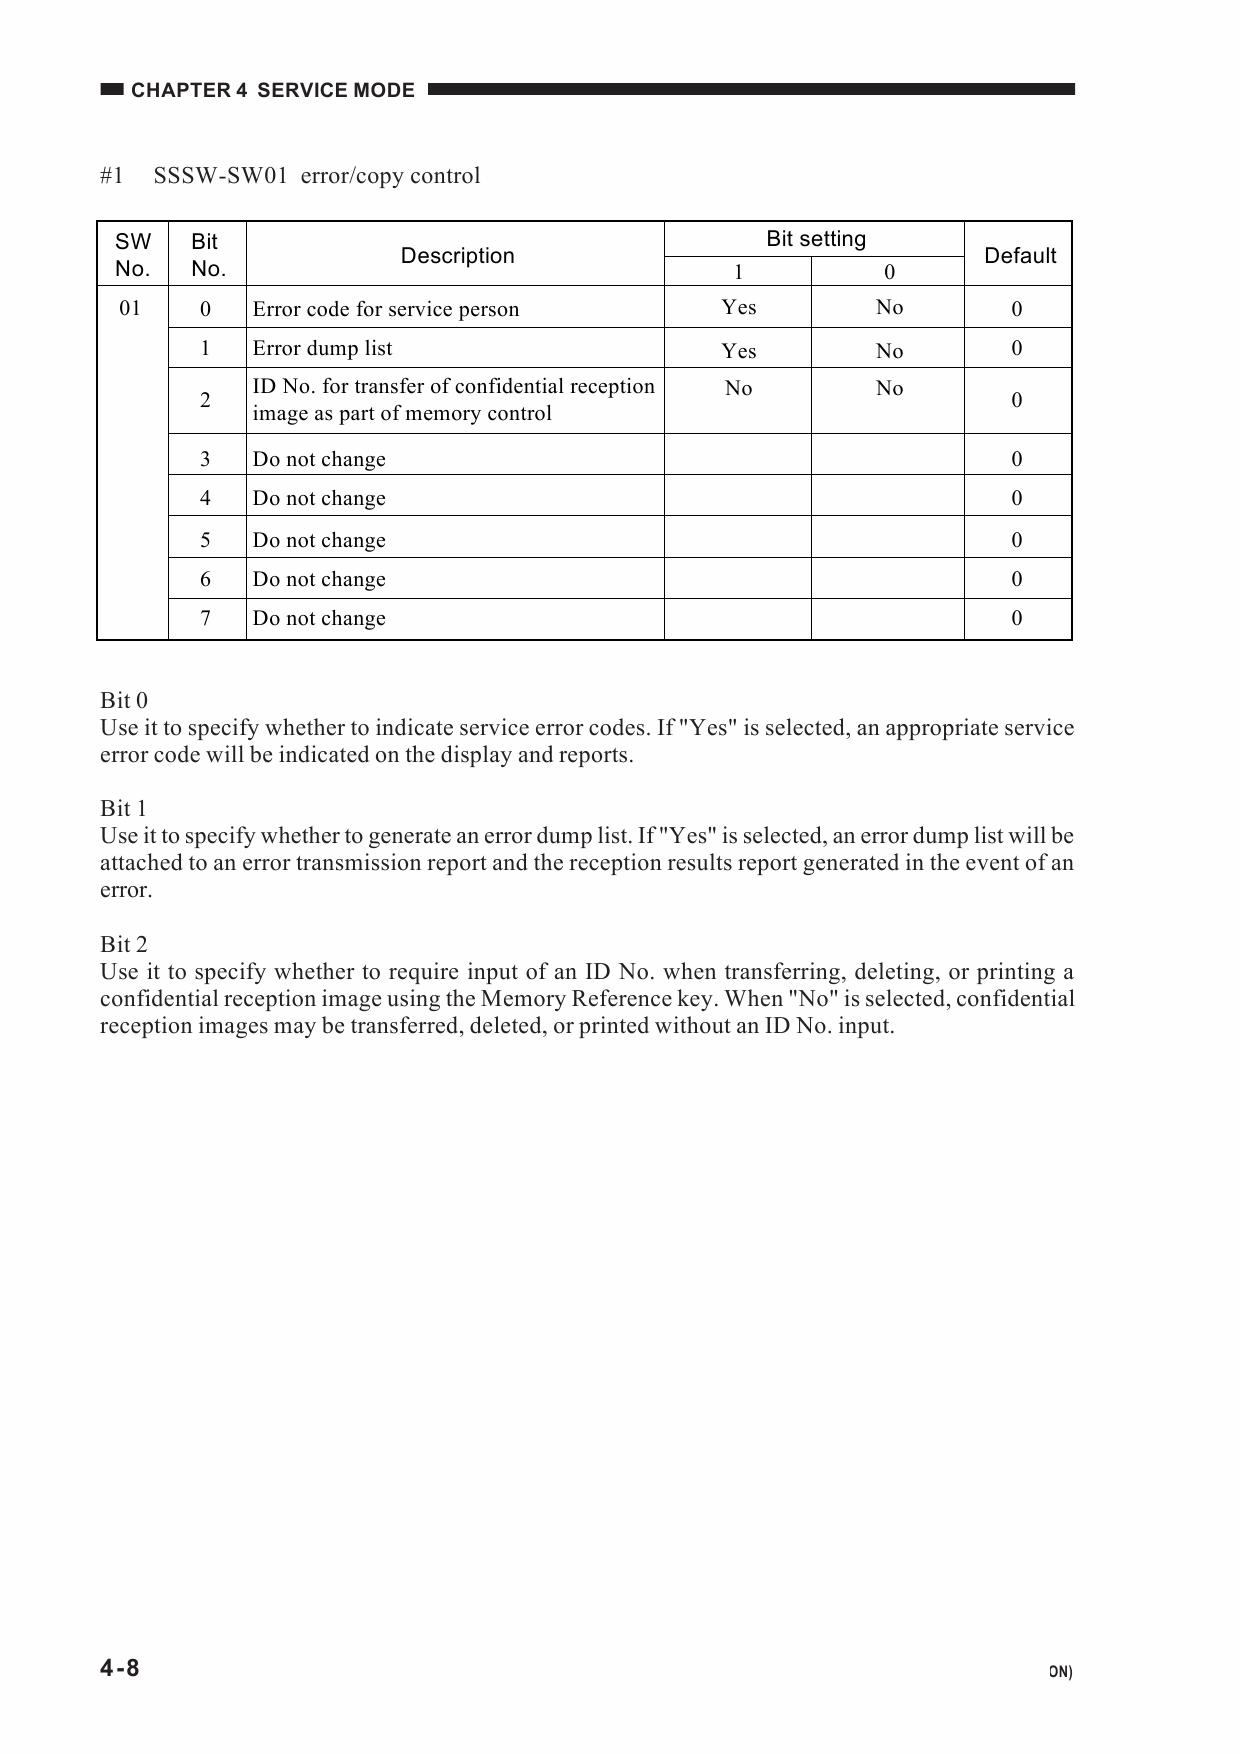 canon options fax